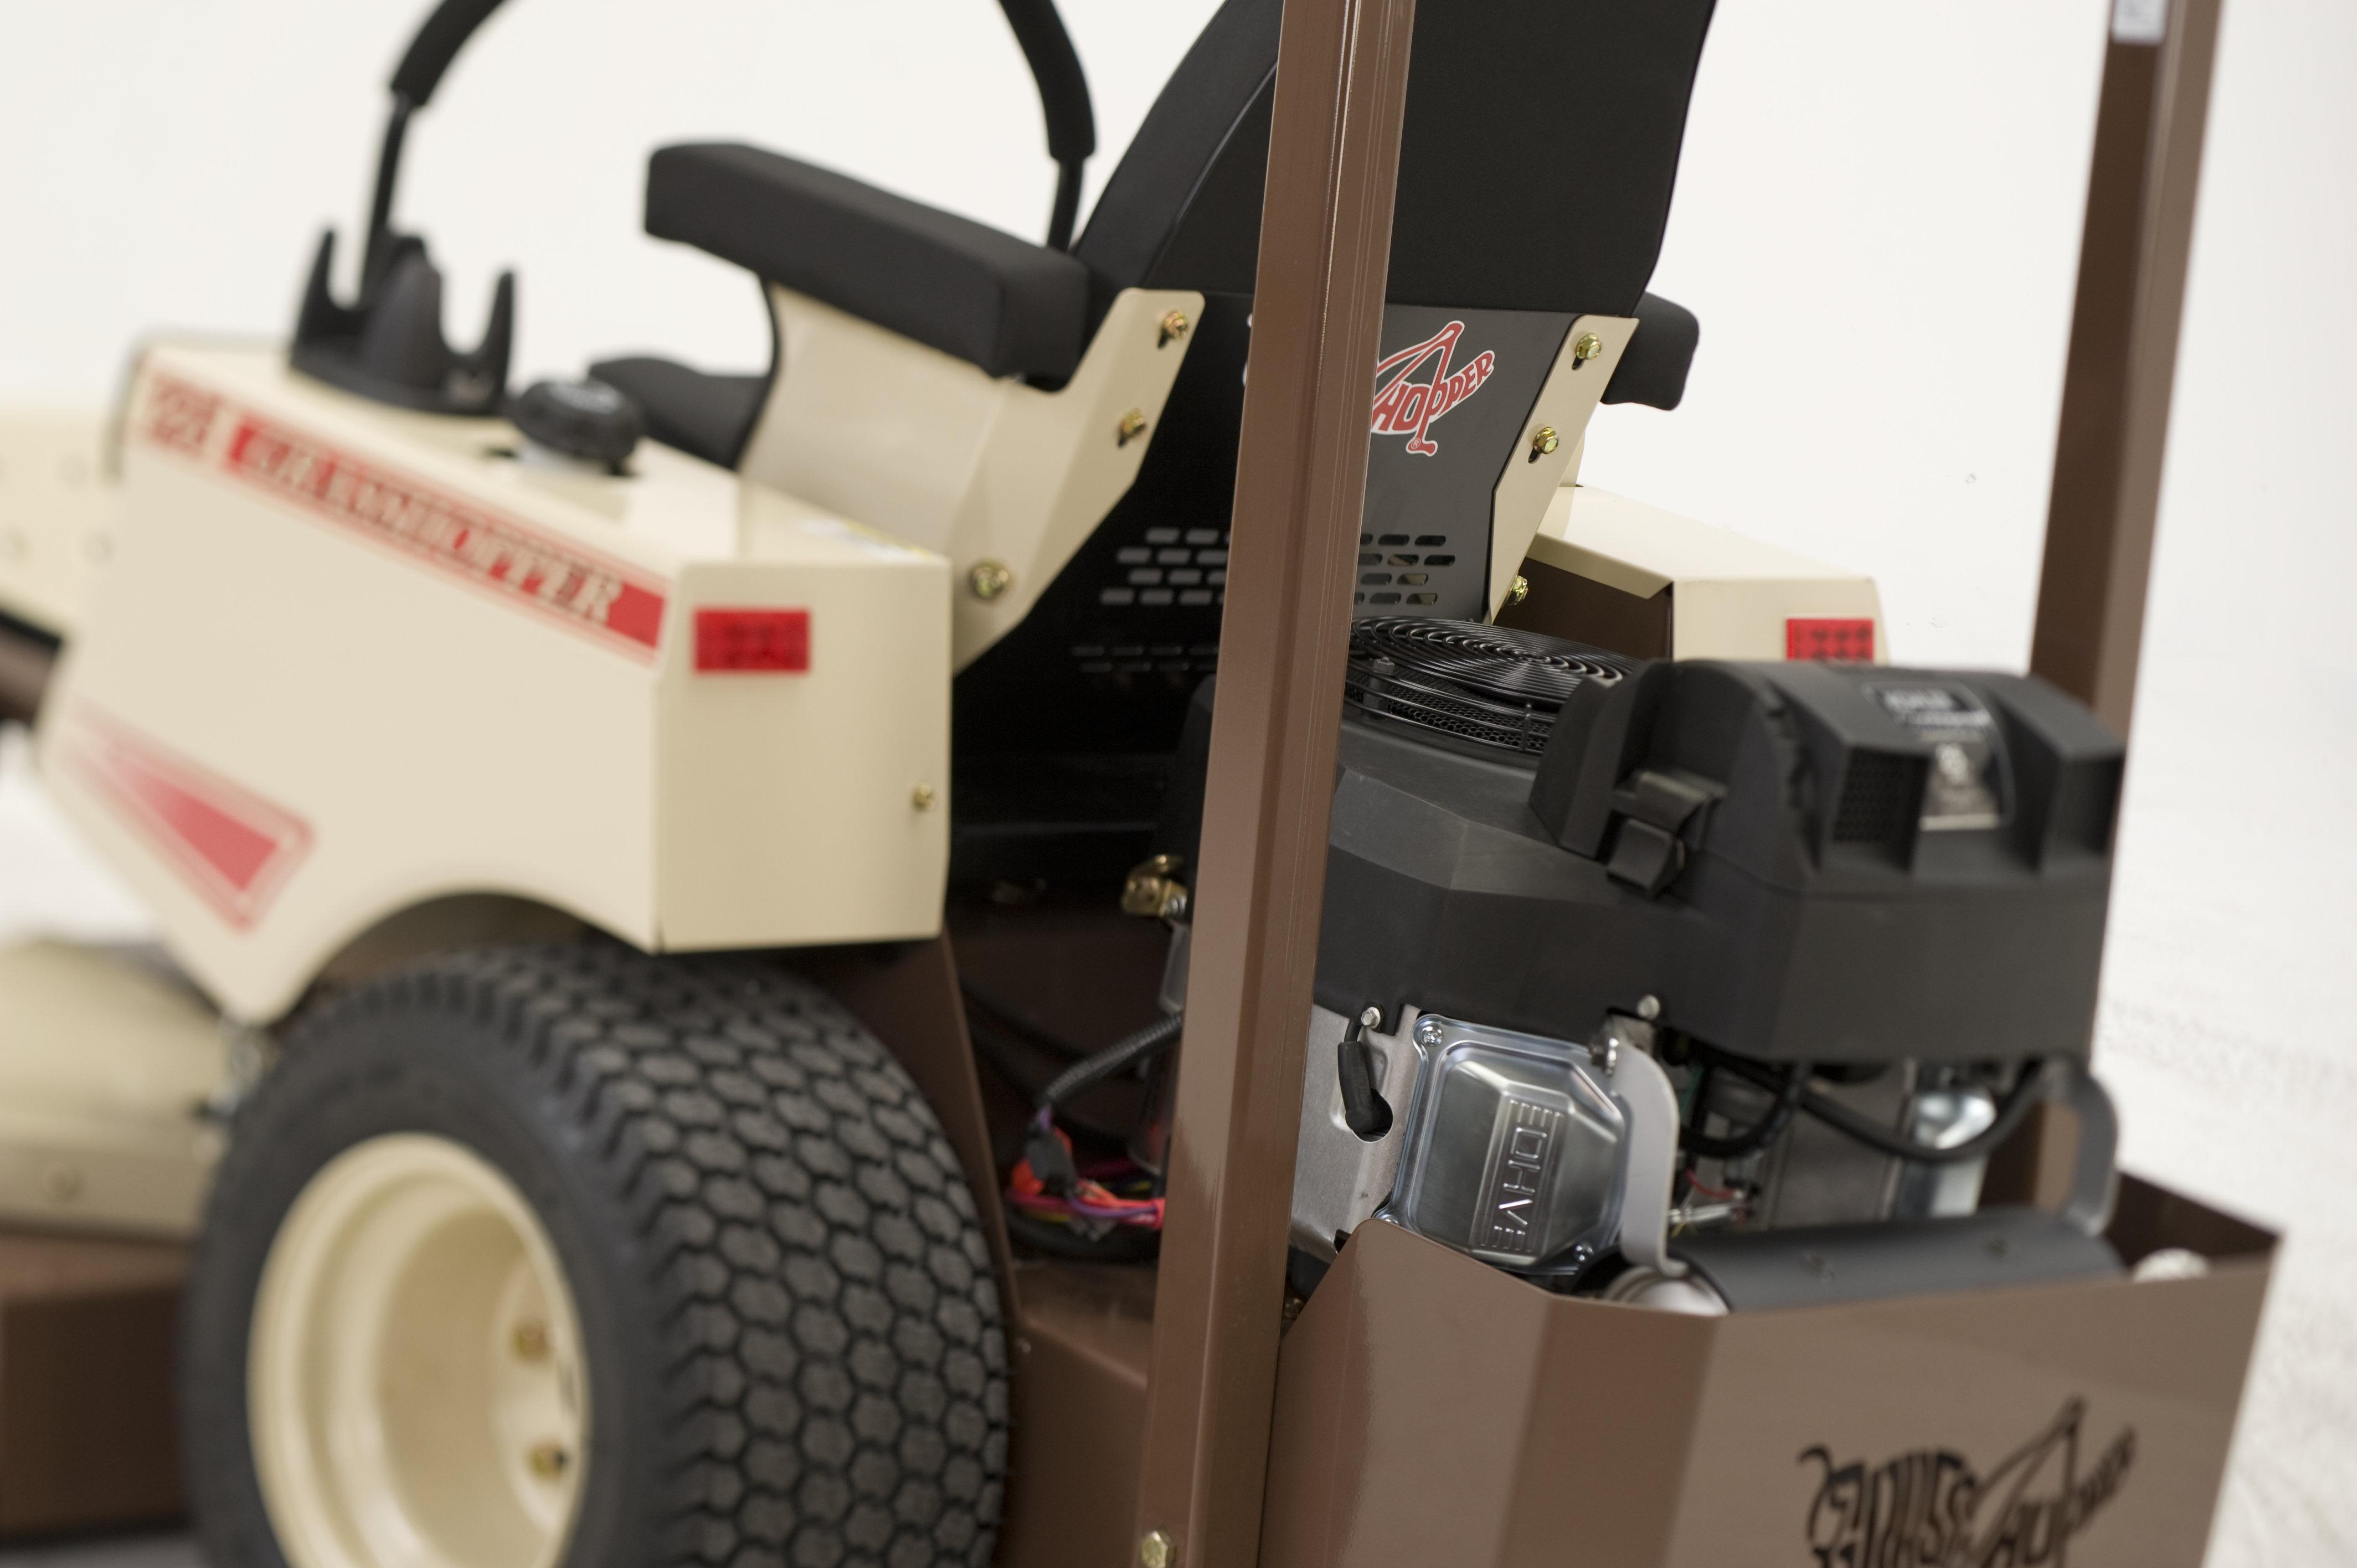 Choosing the best zero-turn mower | Grasshopper Mower